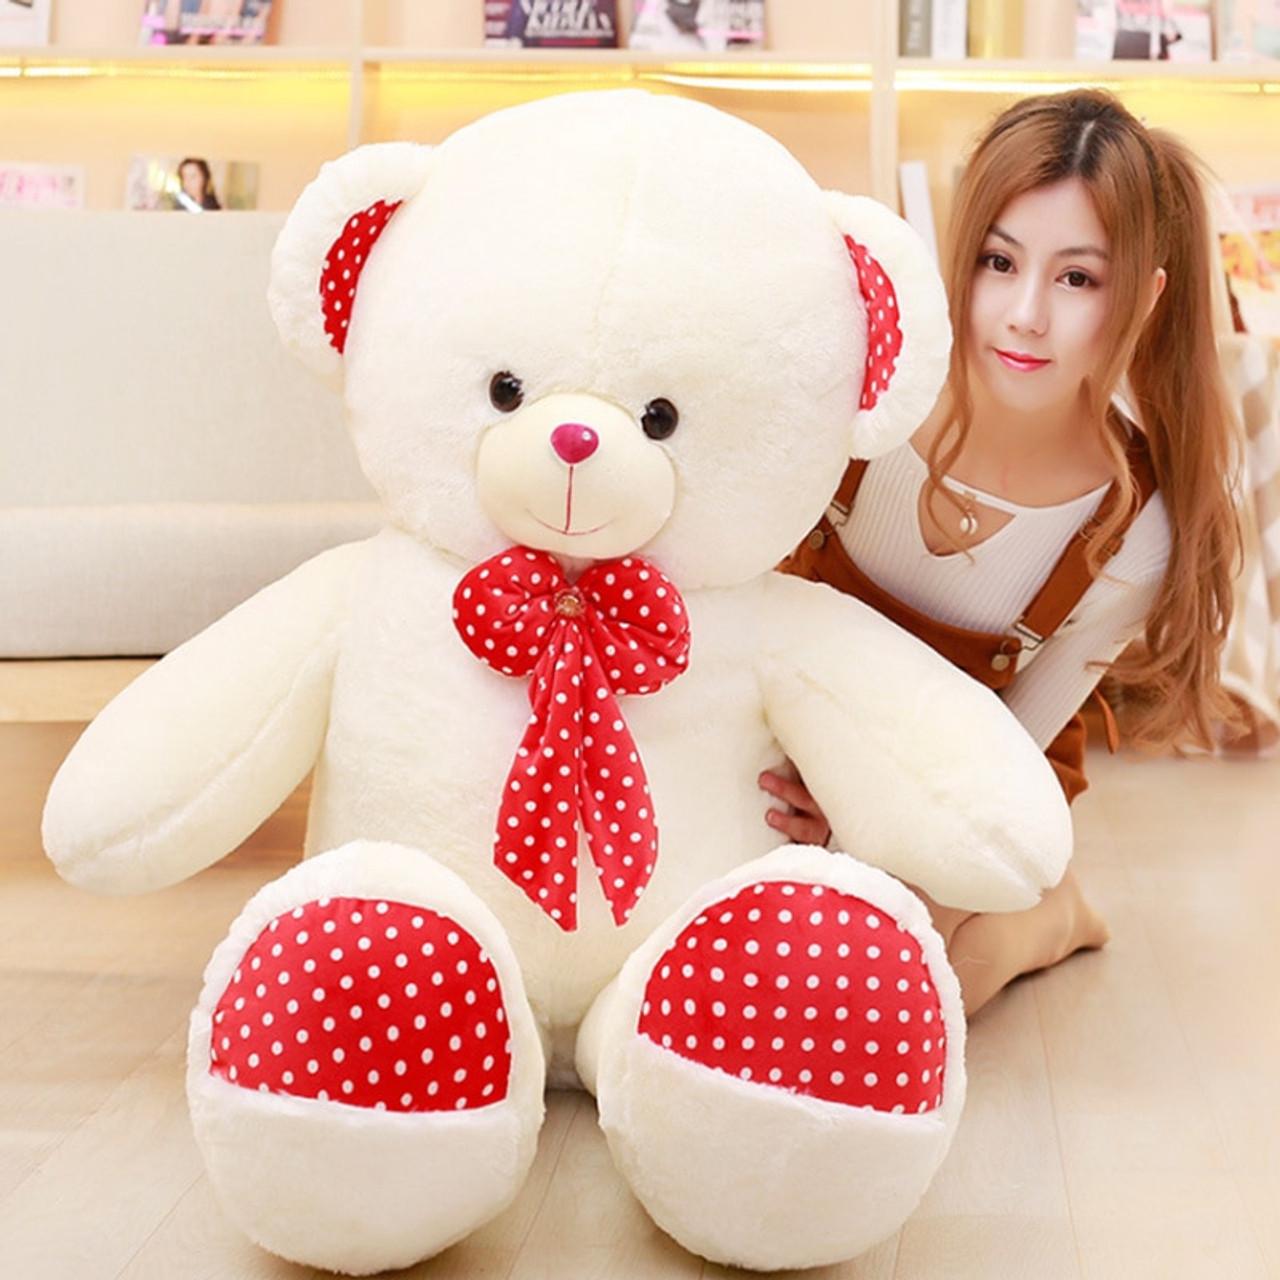 HOT Giant Huge Big Teddy Bear Plush Soft Stuffed Doll Toy For Girlfriends Gift